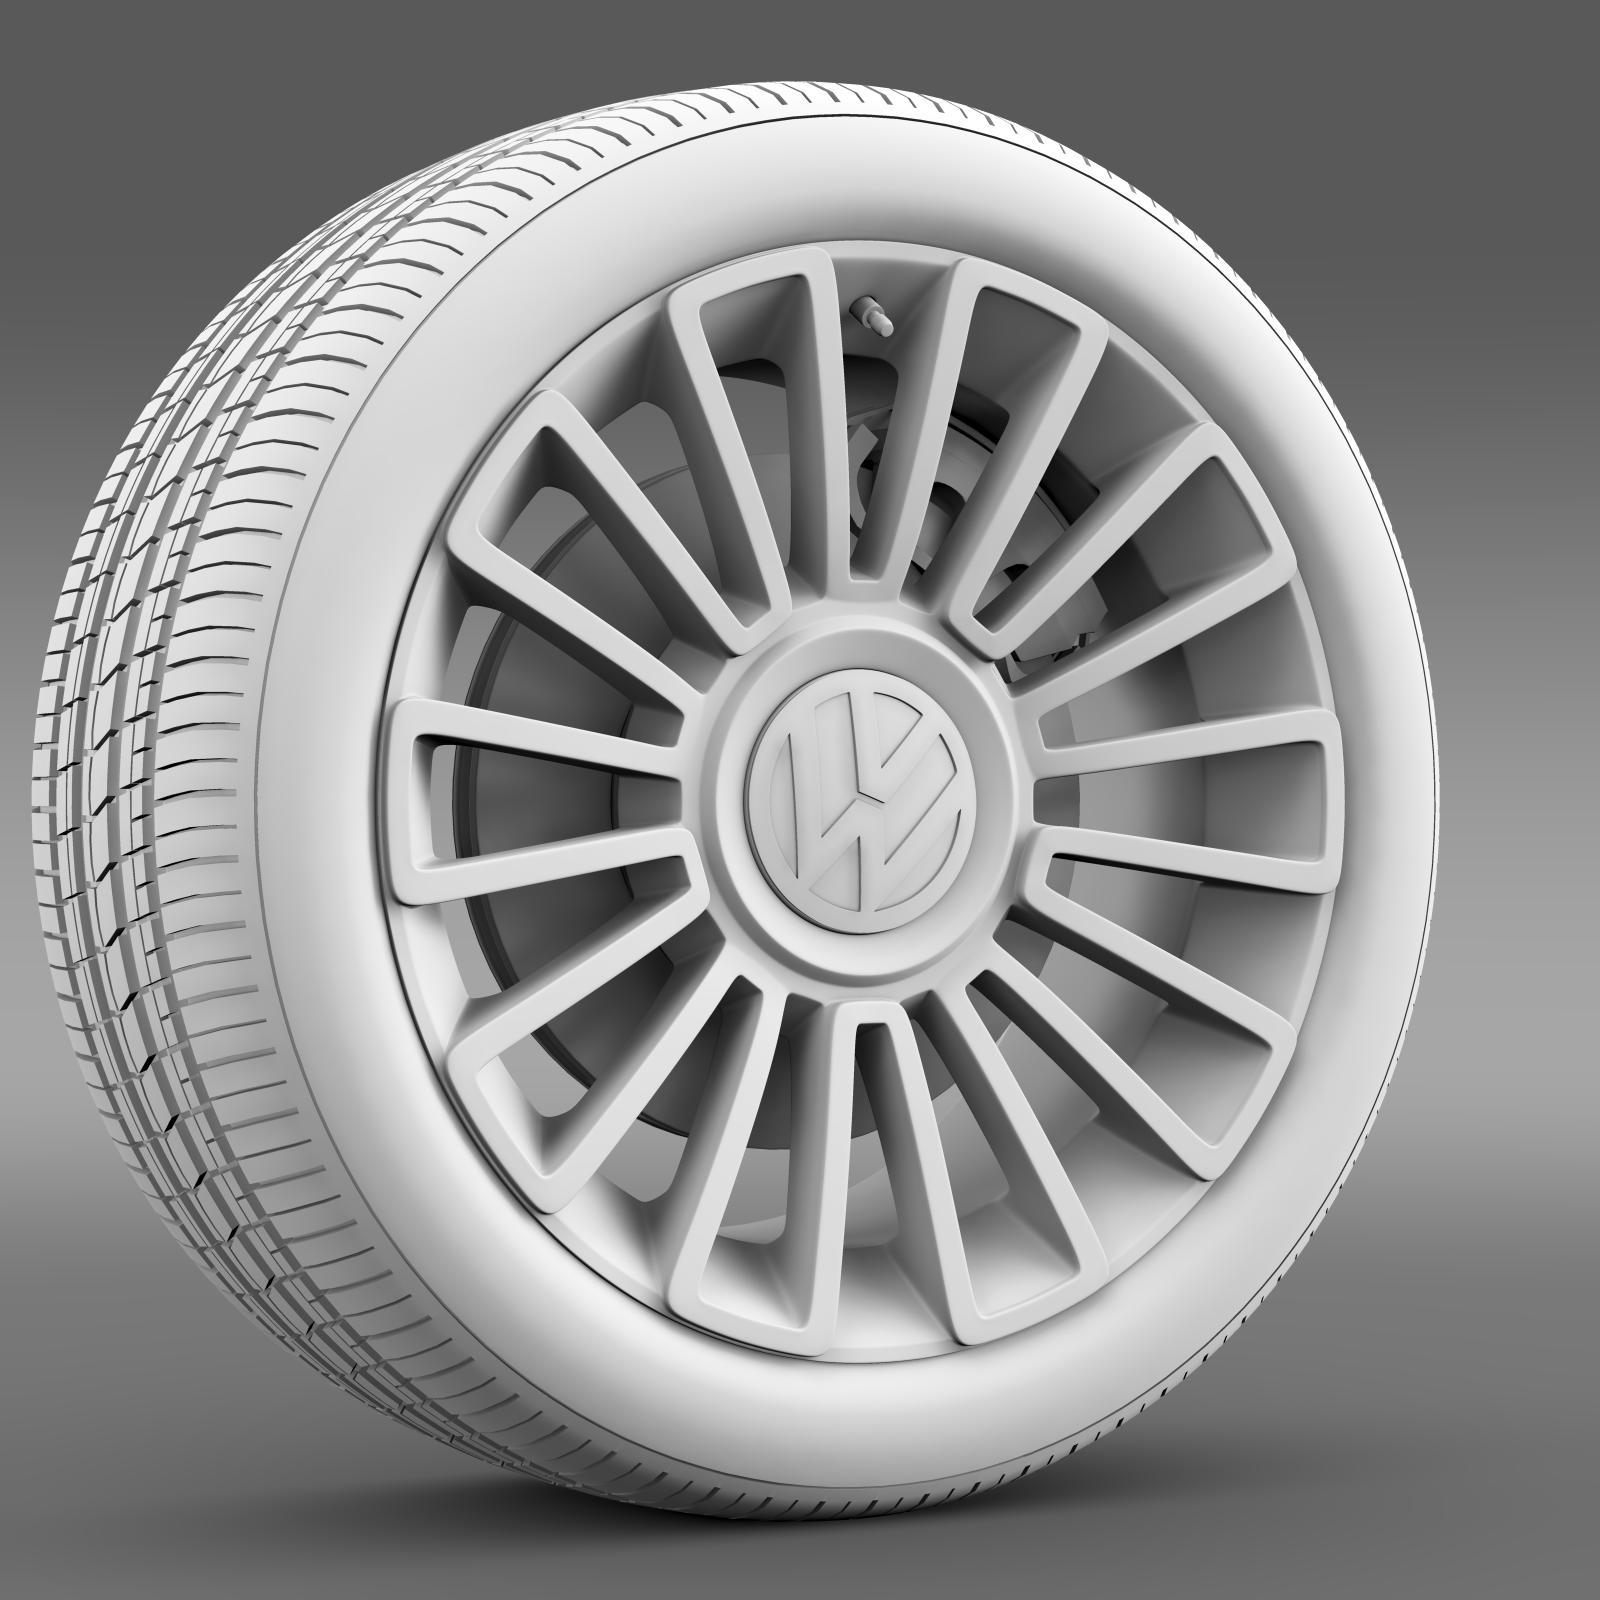 volkswagen up wheel 3d model 3ds max fbx c4d lwo ma mb hrc xsi obj 210890